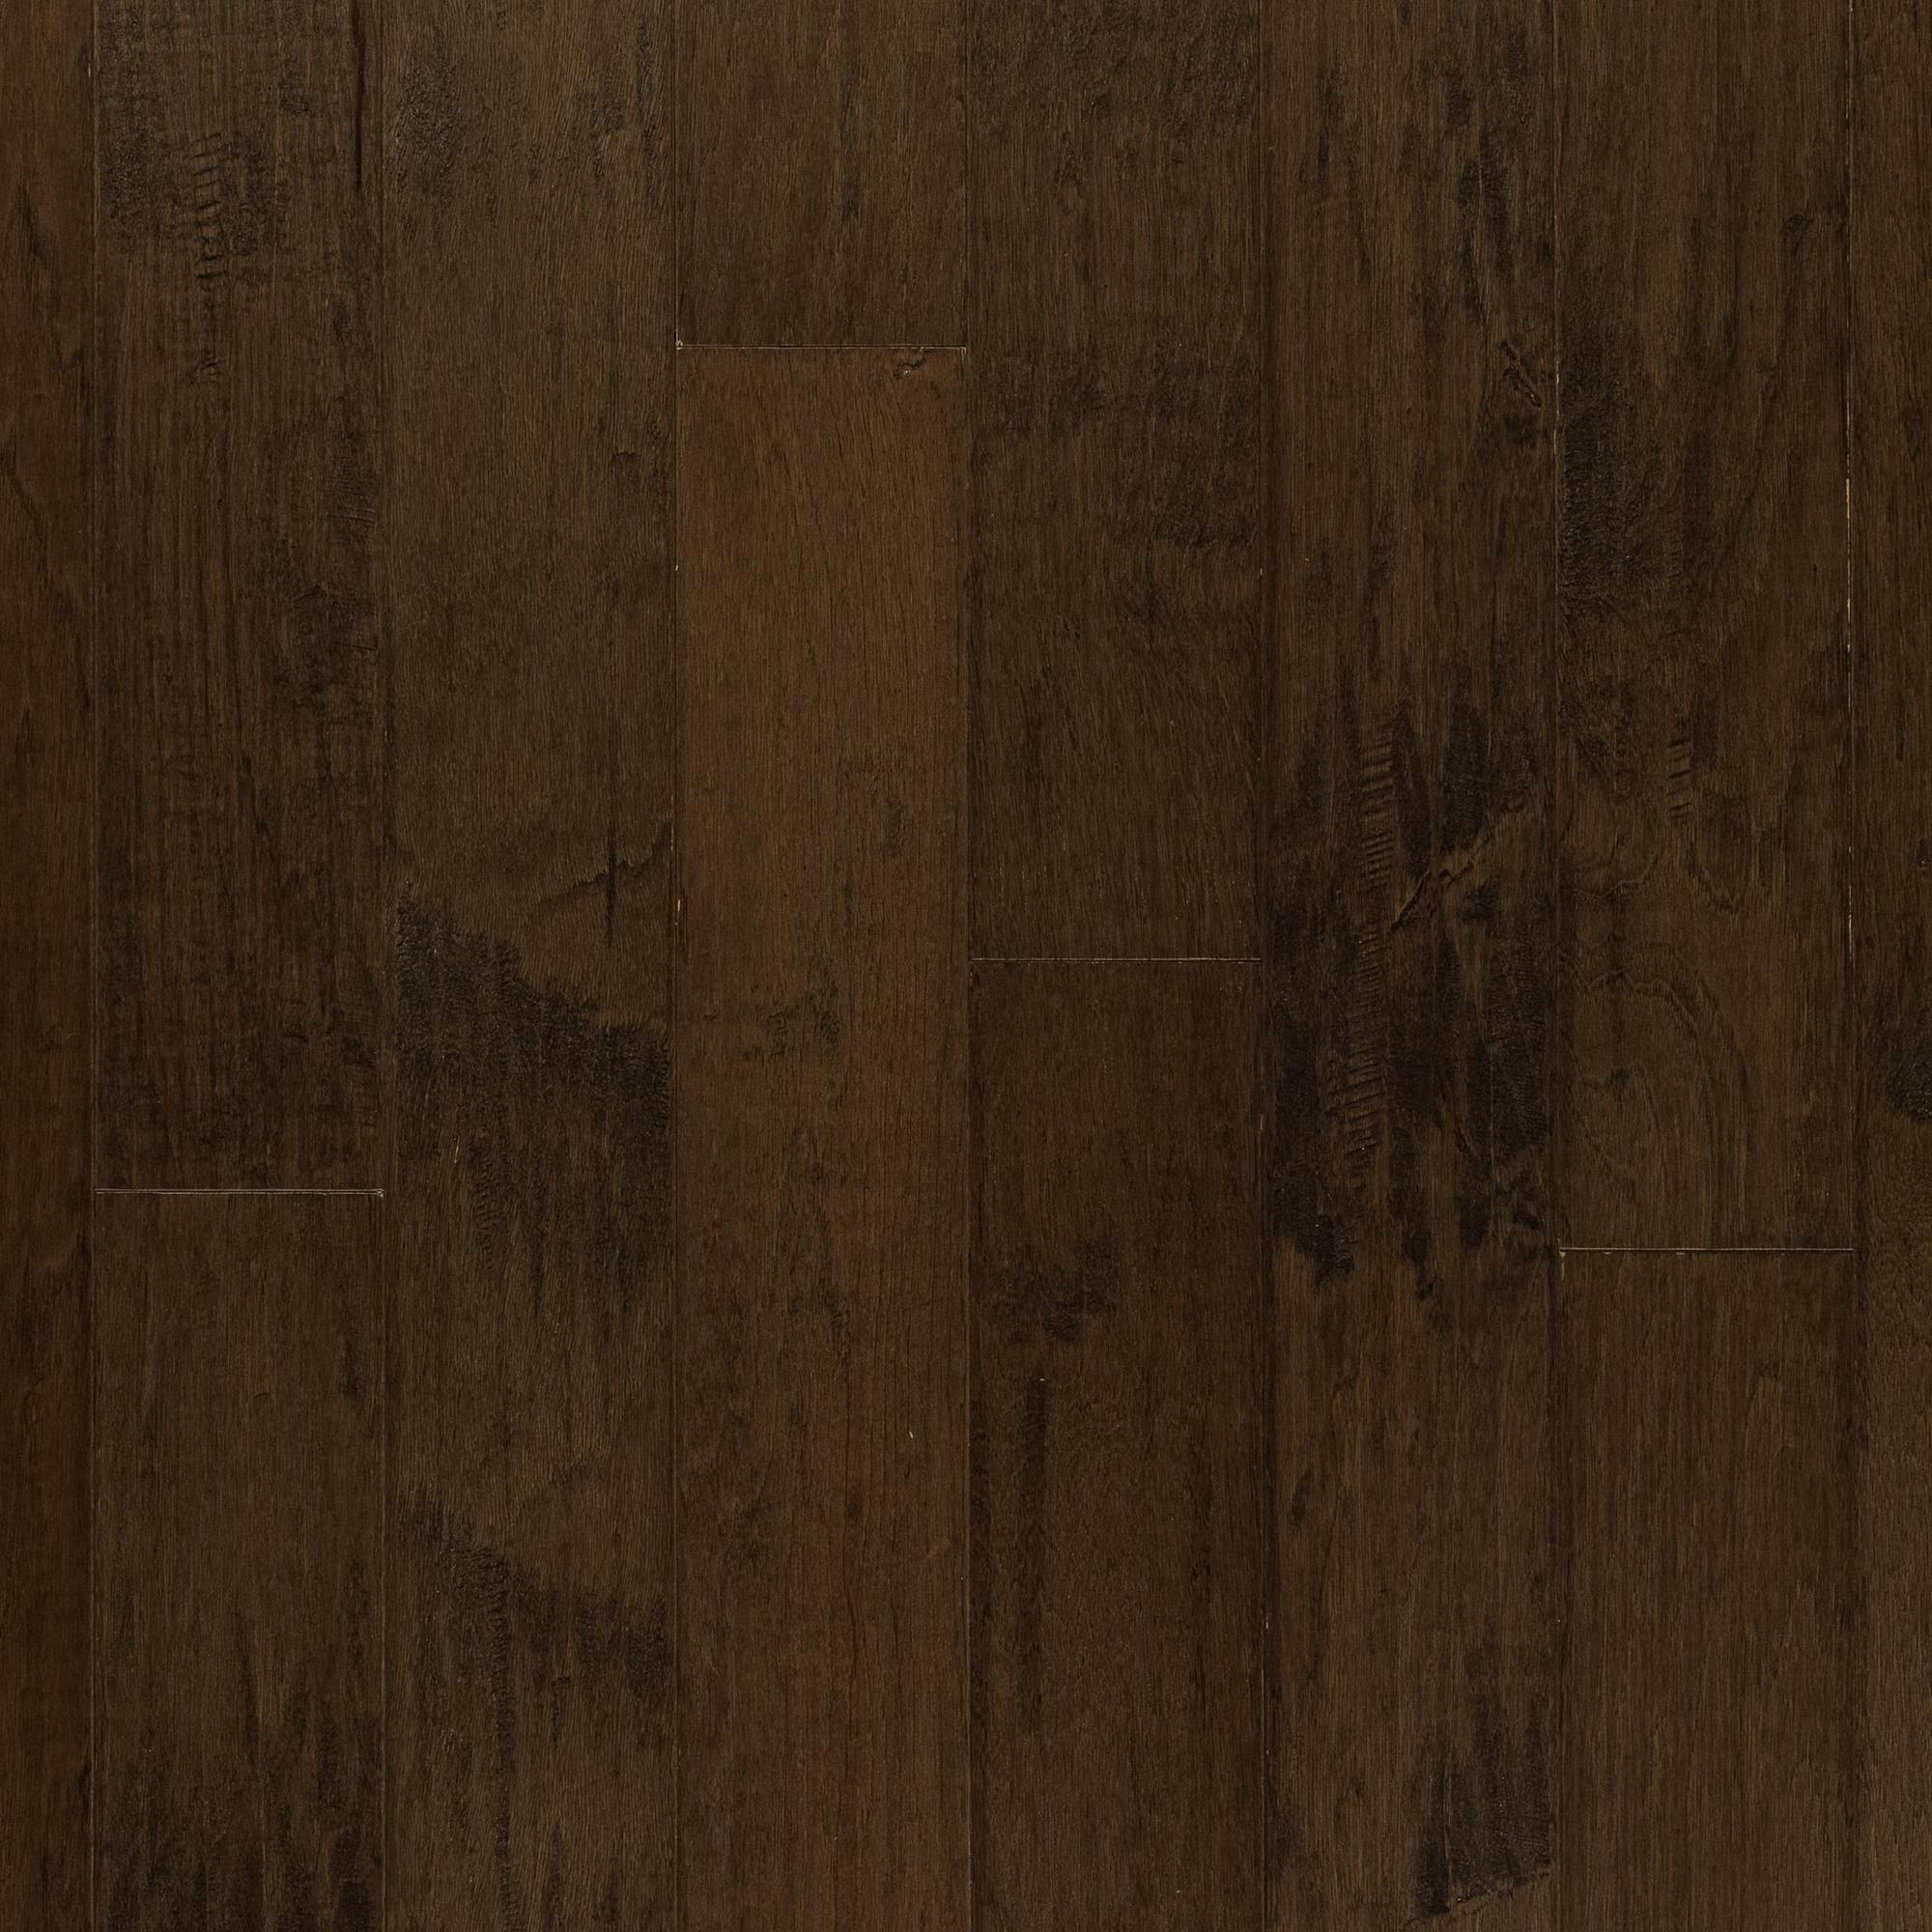 Hickory Granite WireBrushed Engineered Hardwood